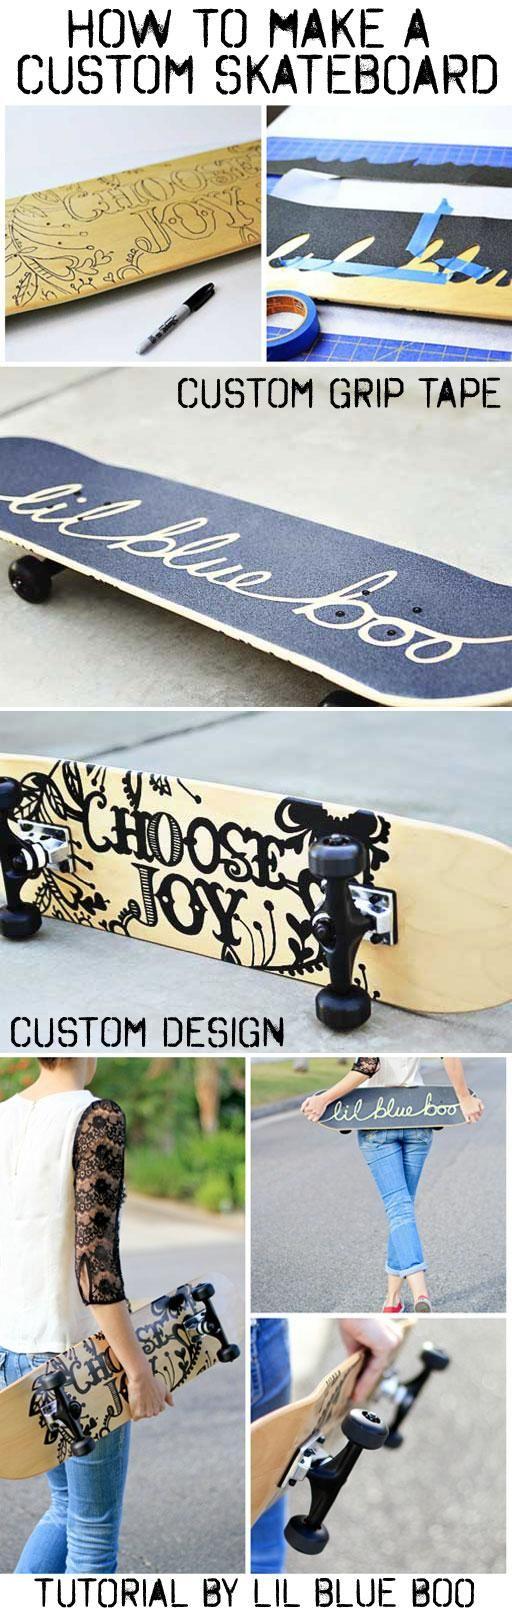 How to make and paint a custom skateboard (custom grip tape to custom design) Great birthday party idea